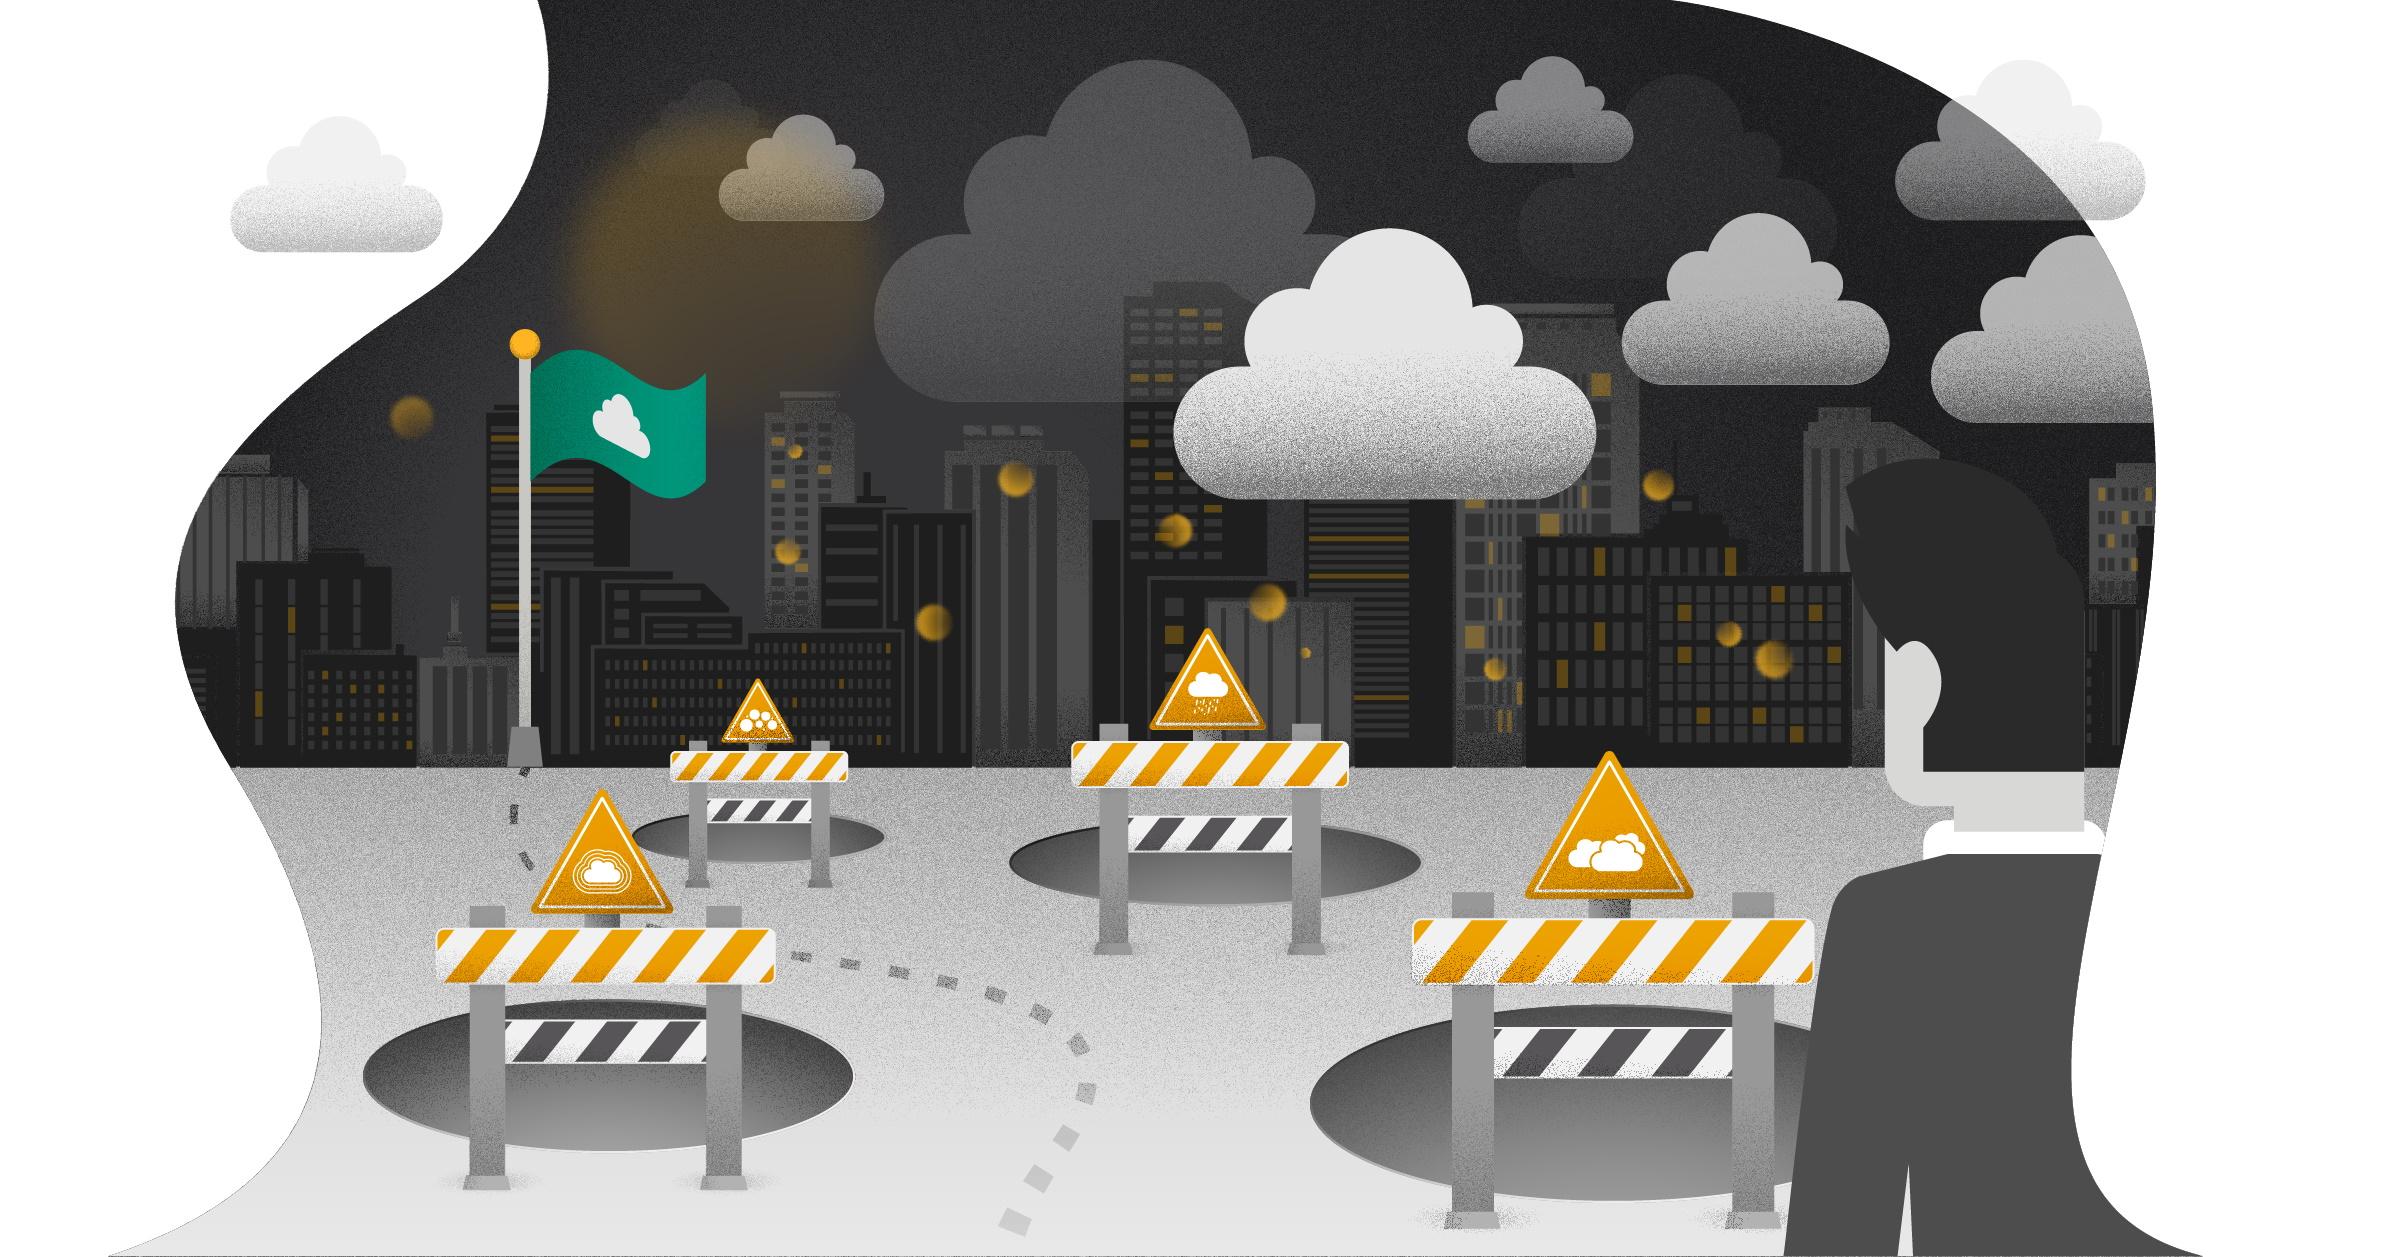 Fire cloud-adoption faldgruber du bør undgå